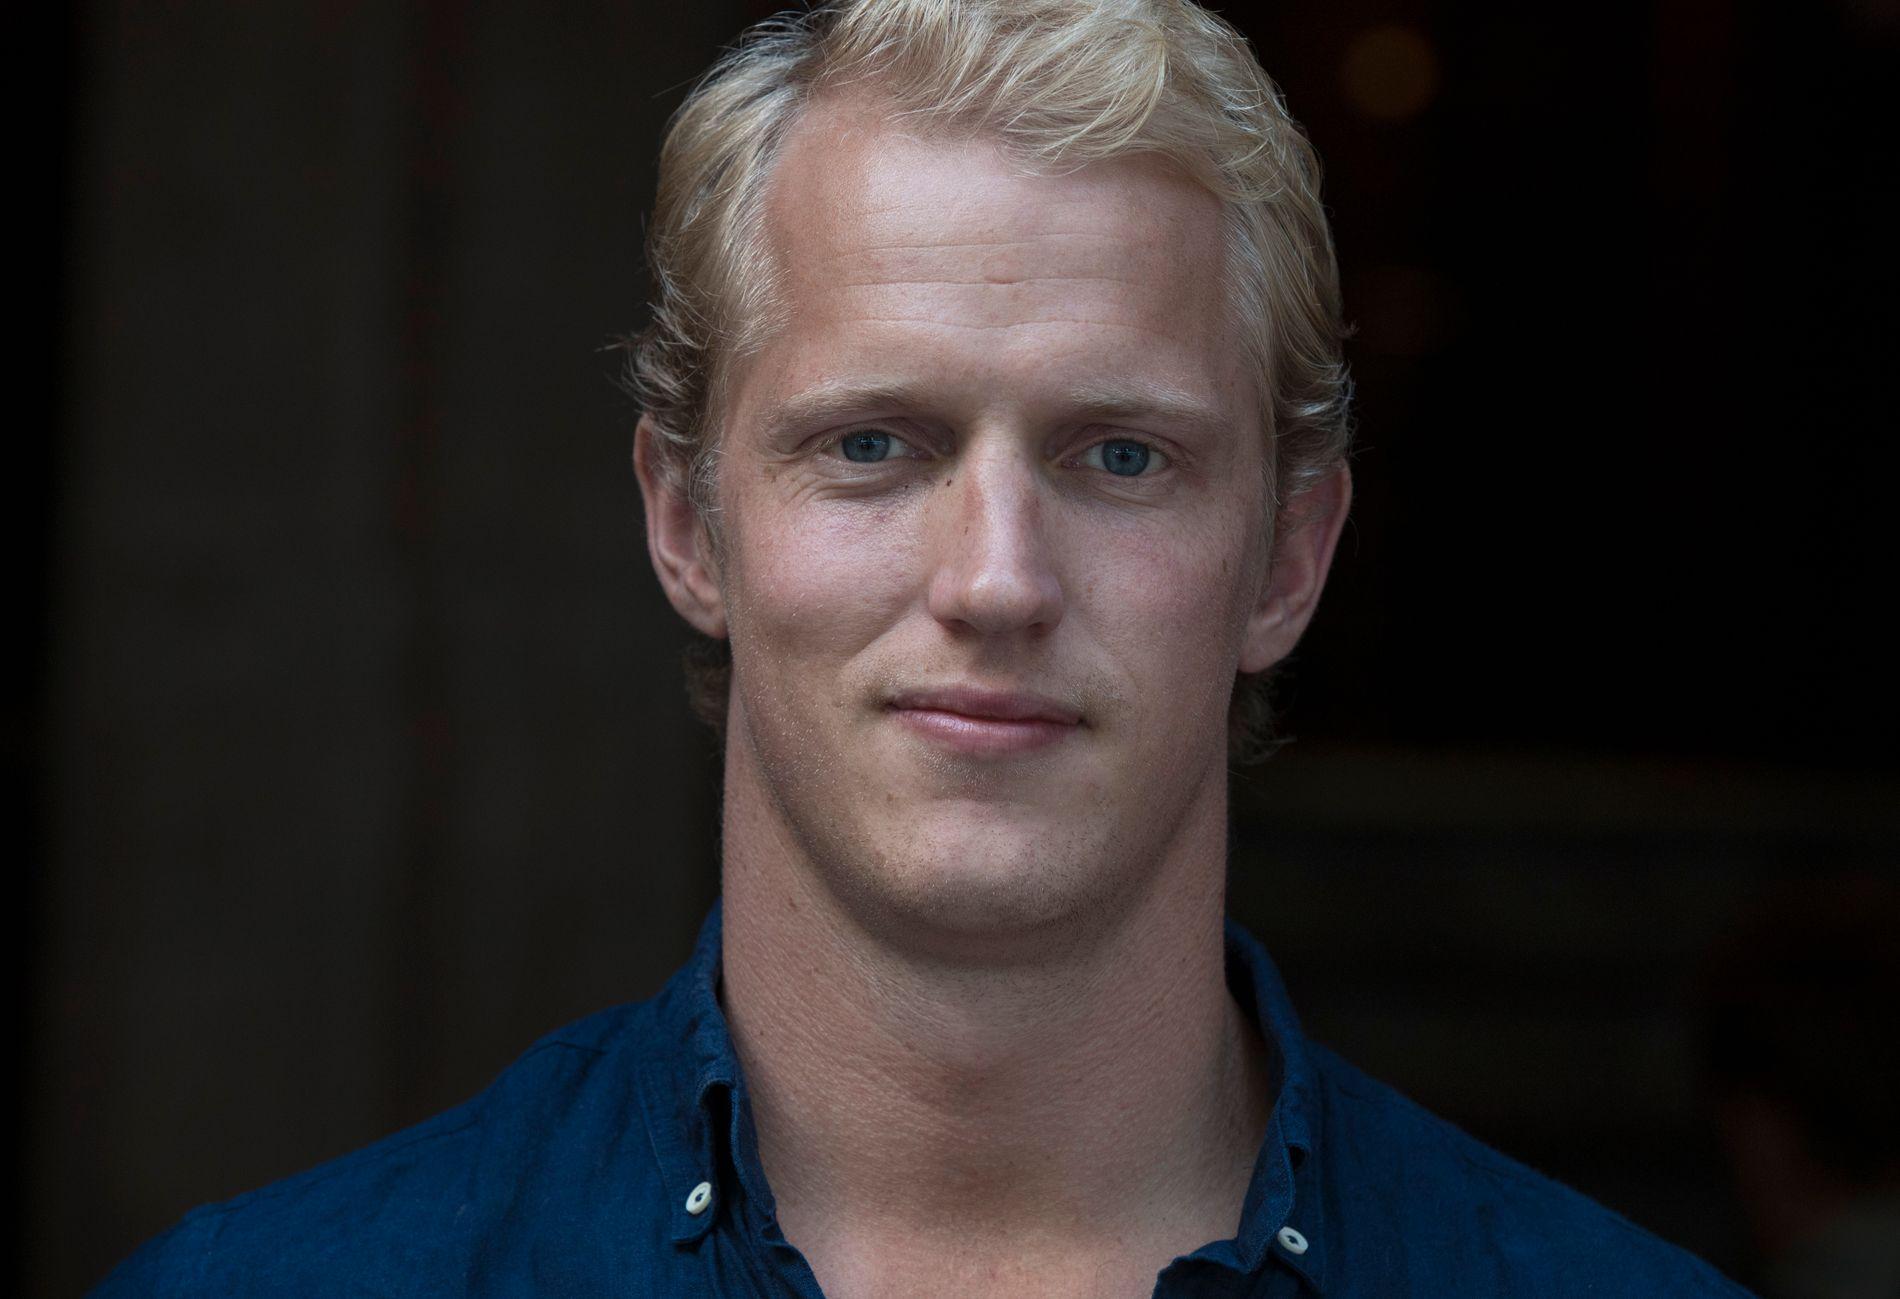 NY KJÆRESTE: Erik Follestad Johansen har funnet lykken med Annie Winquist.